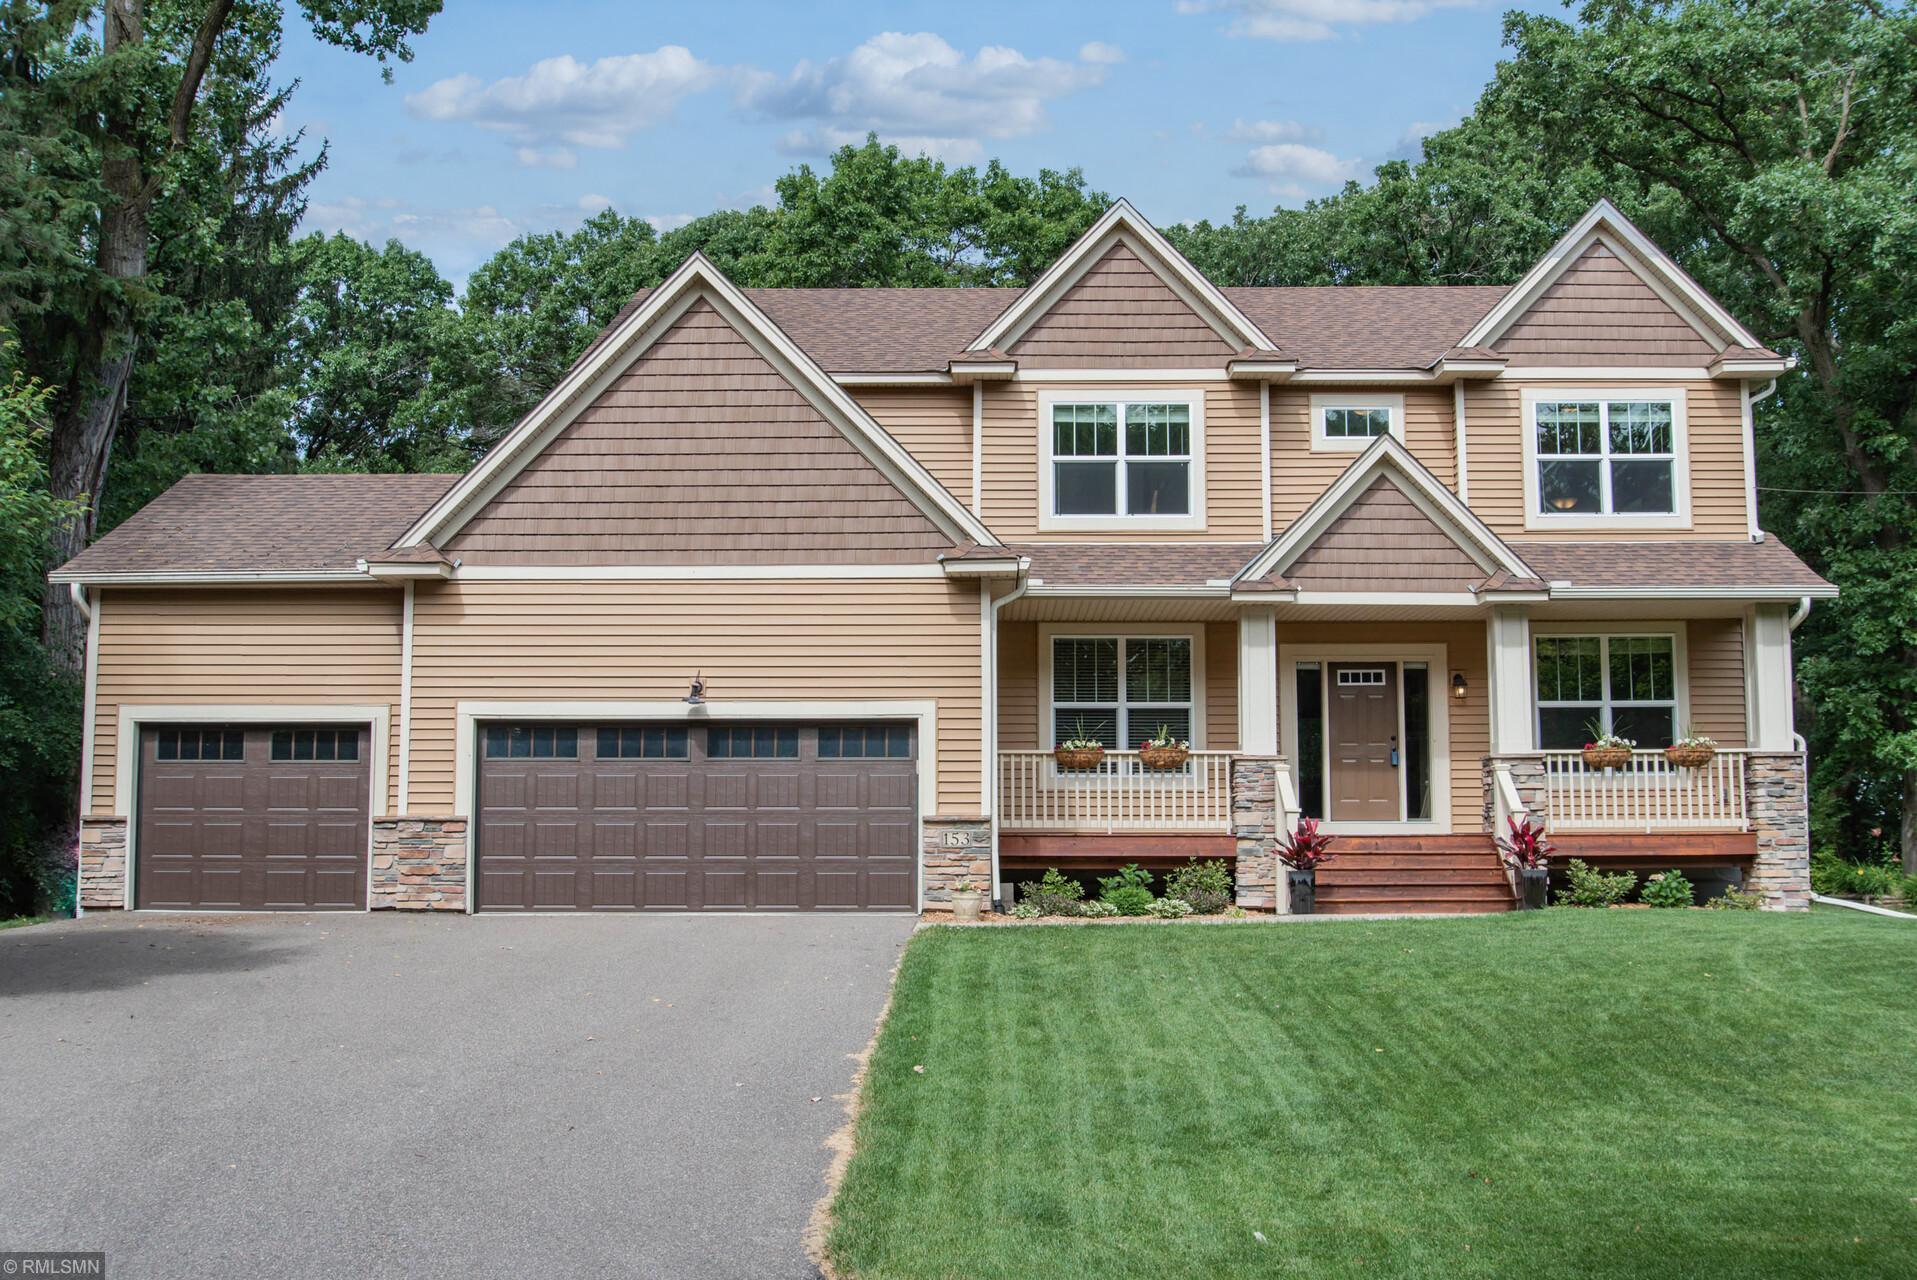 153 Arcwood Property Photo - Mahtomedi, MN real estate listing